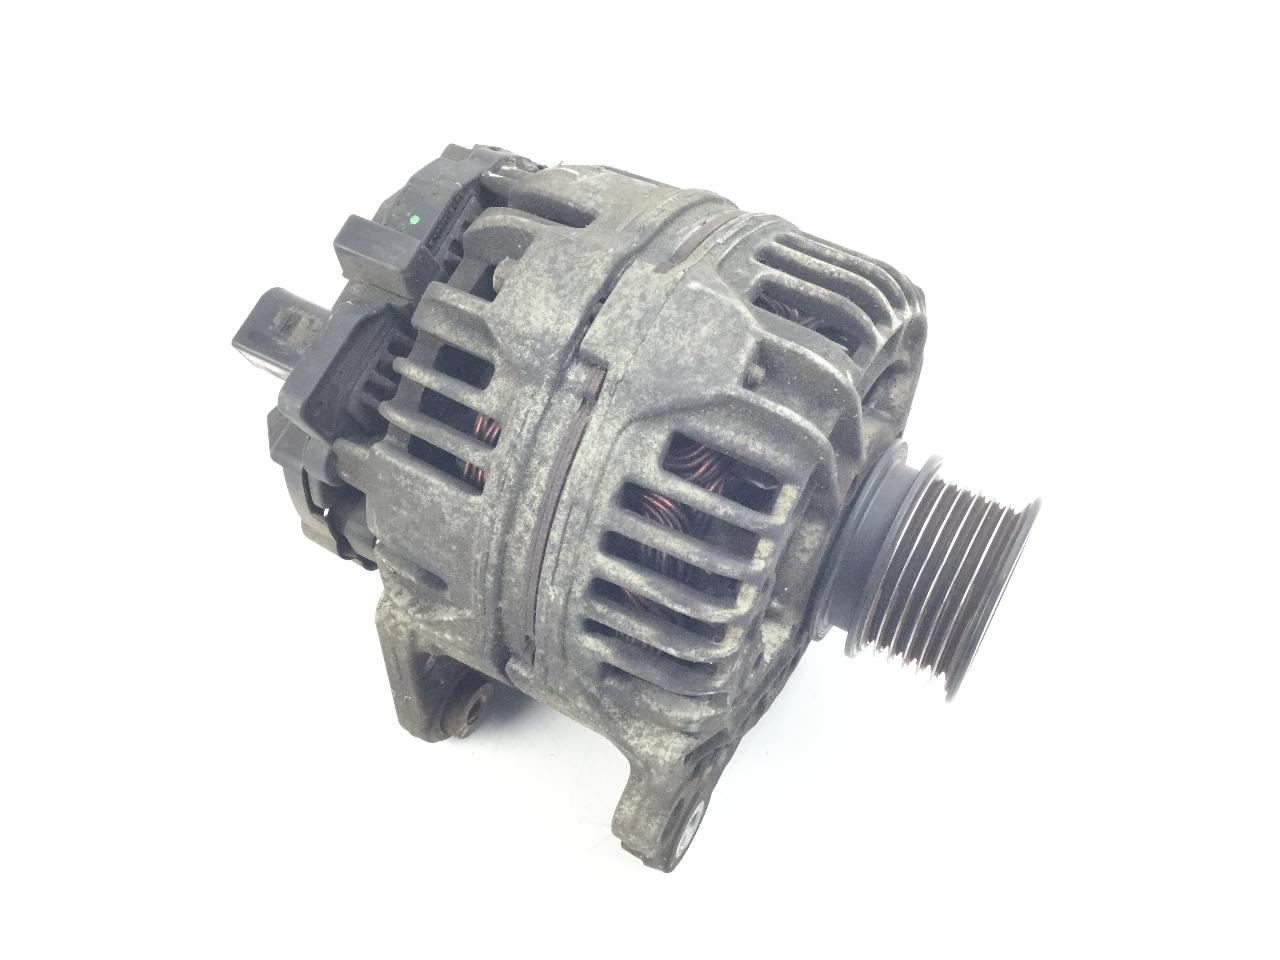 6X1, 6E1 1.0 Lichtmaschine VW LUPO